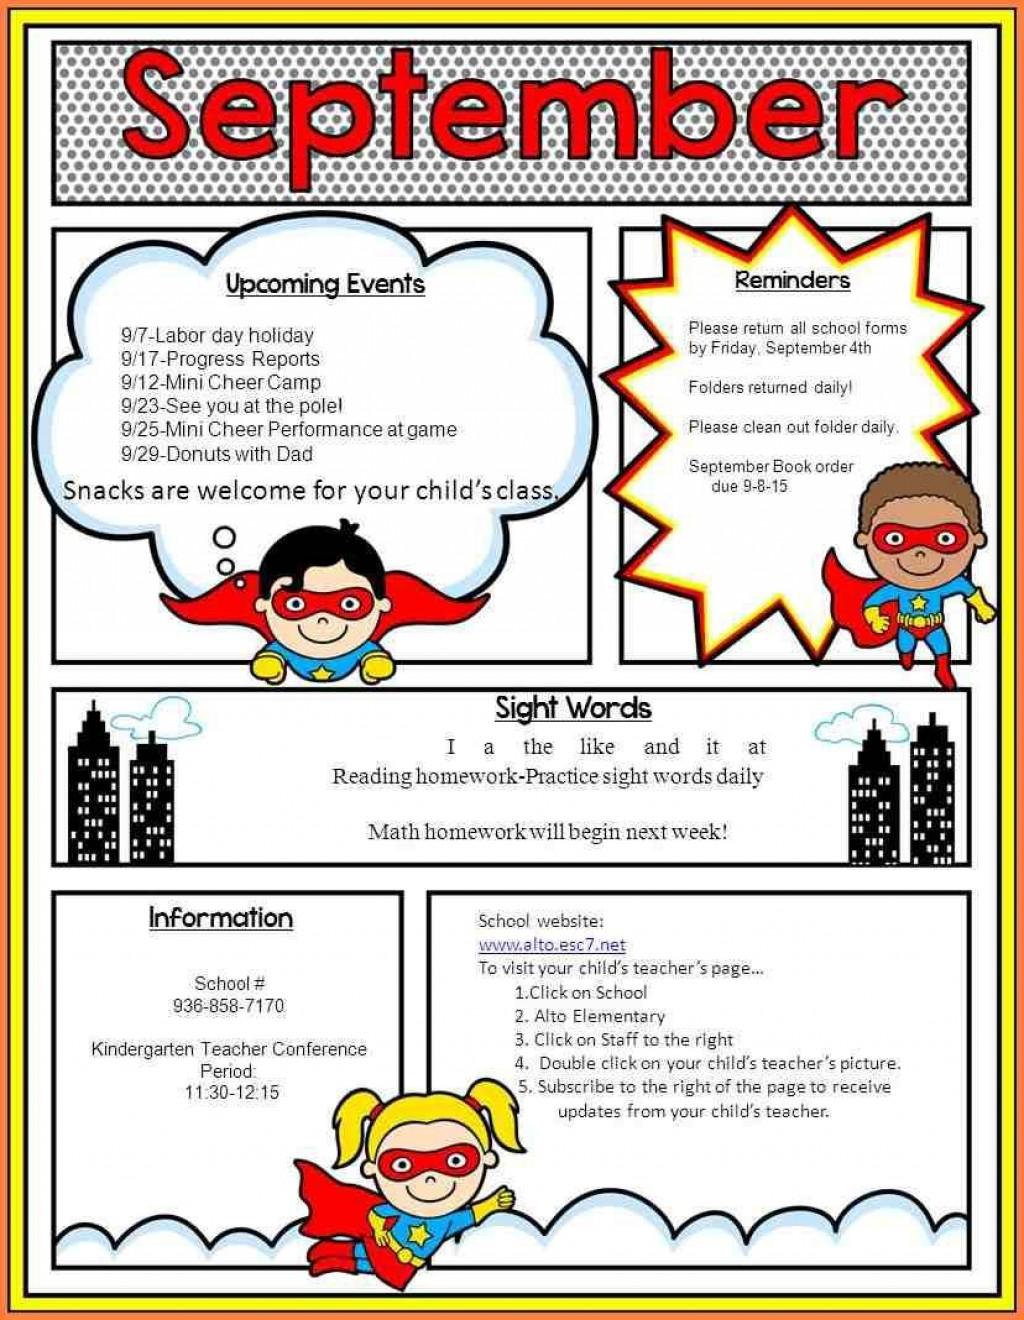 007 Fantastic Elementary School Newsletter Template Inspiration  Clas Teacher Free CounselorLarge